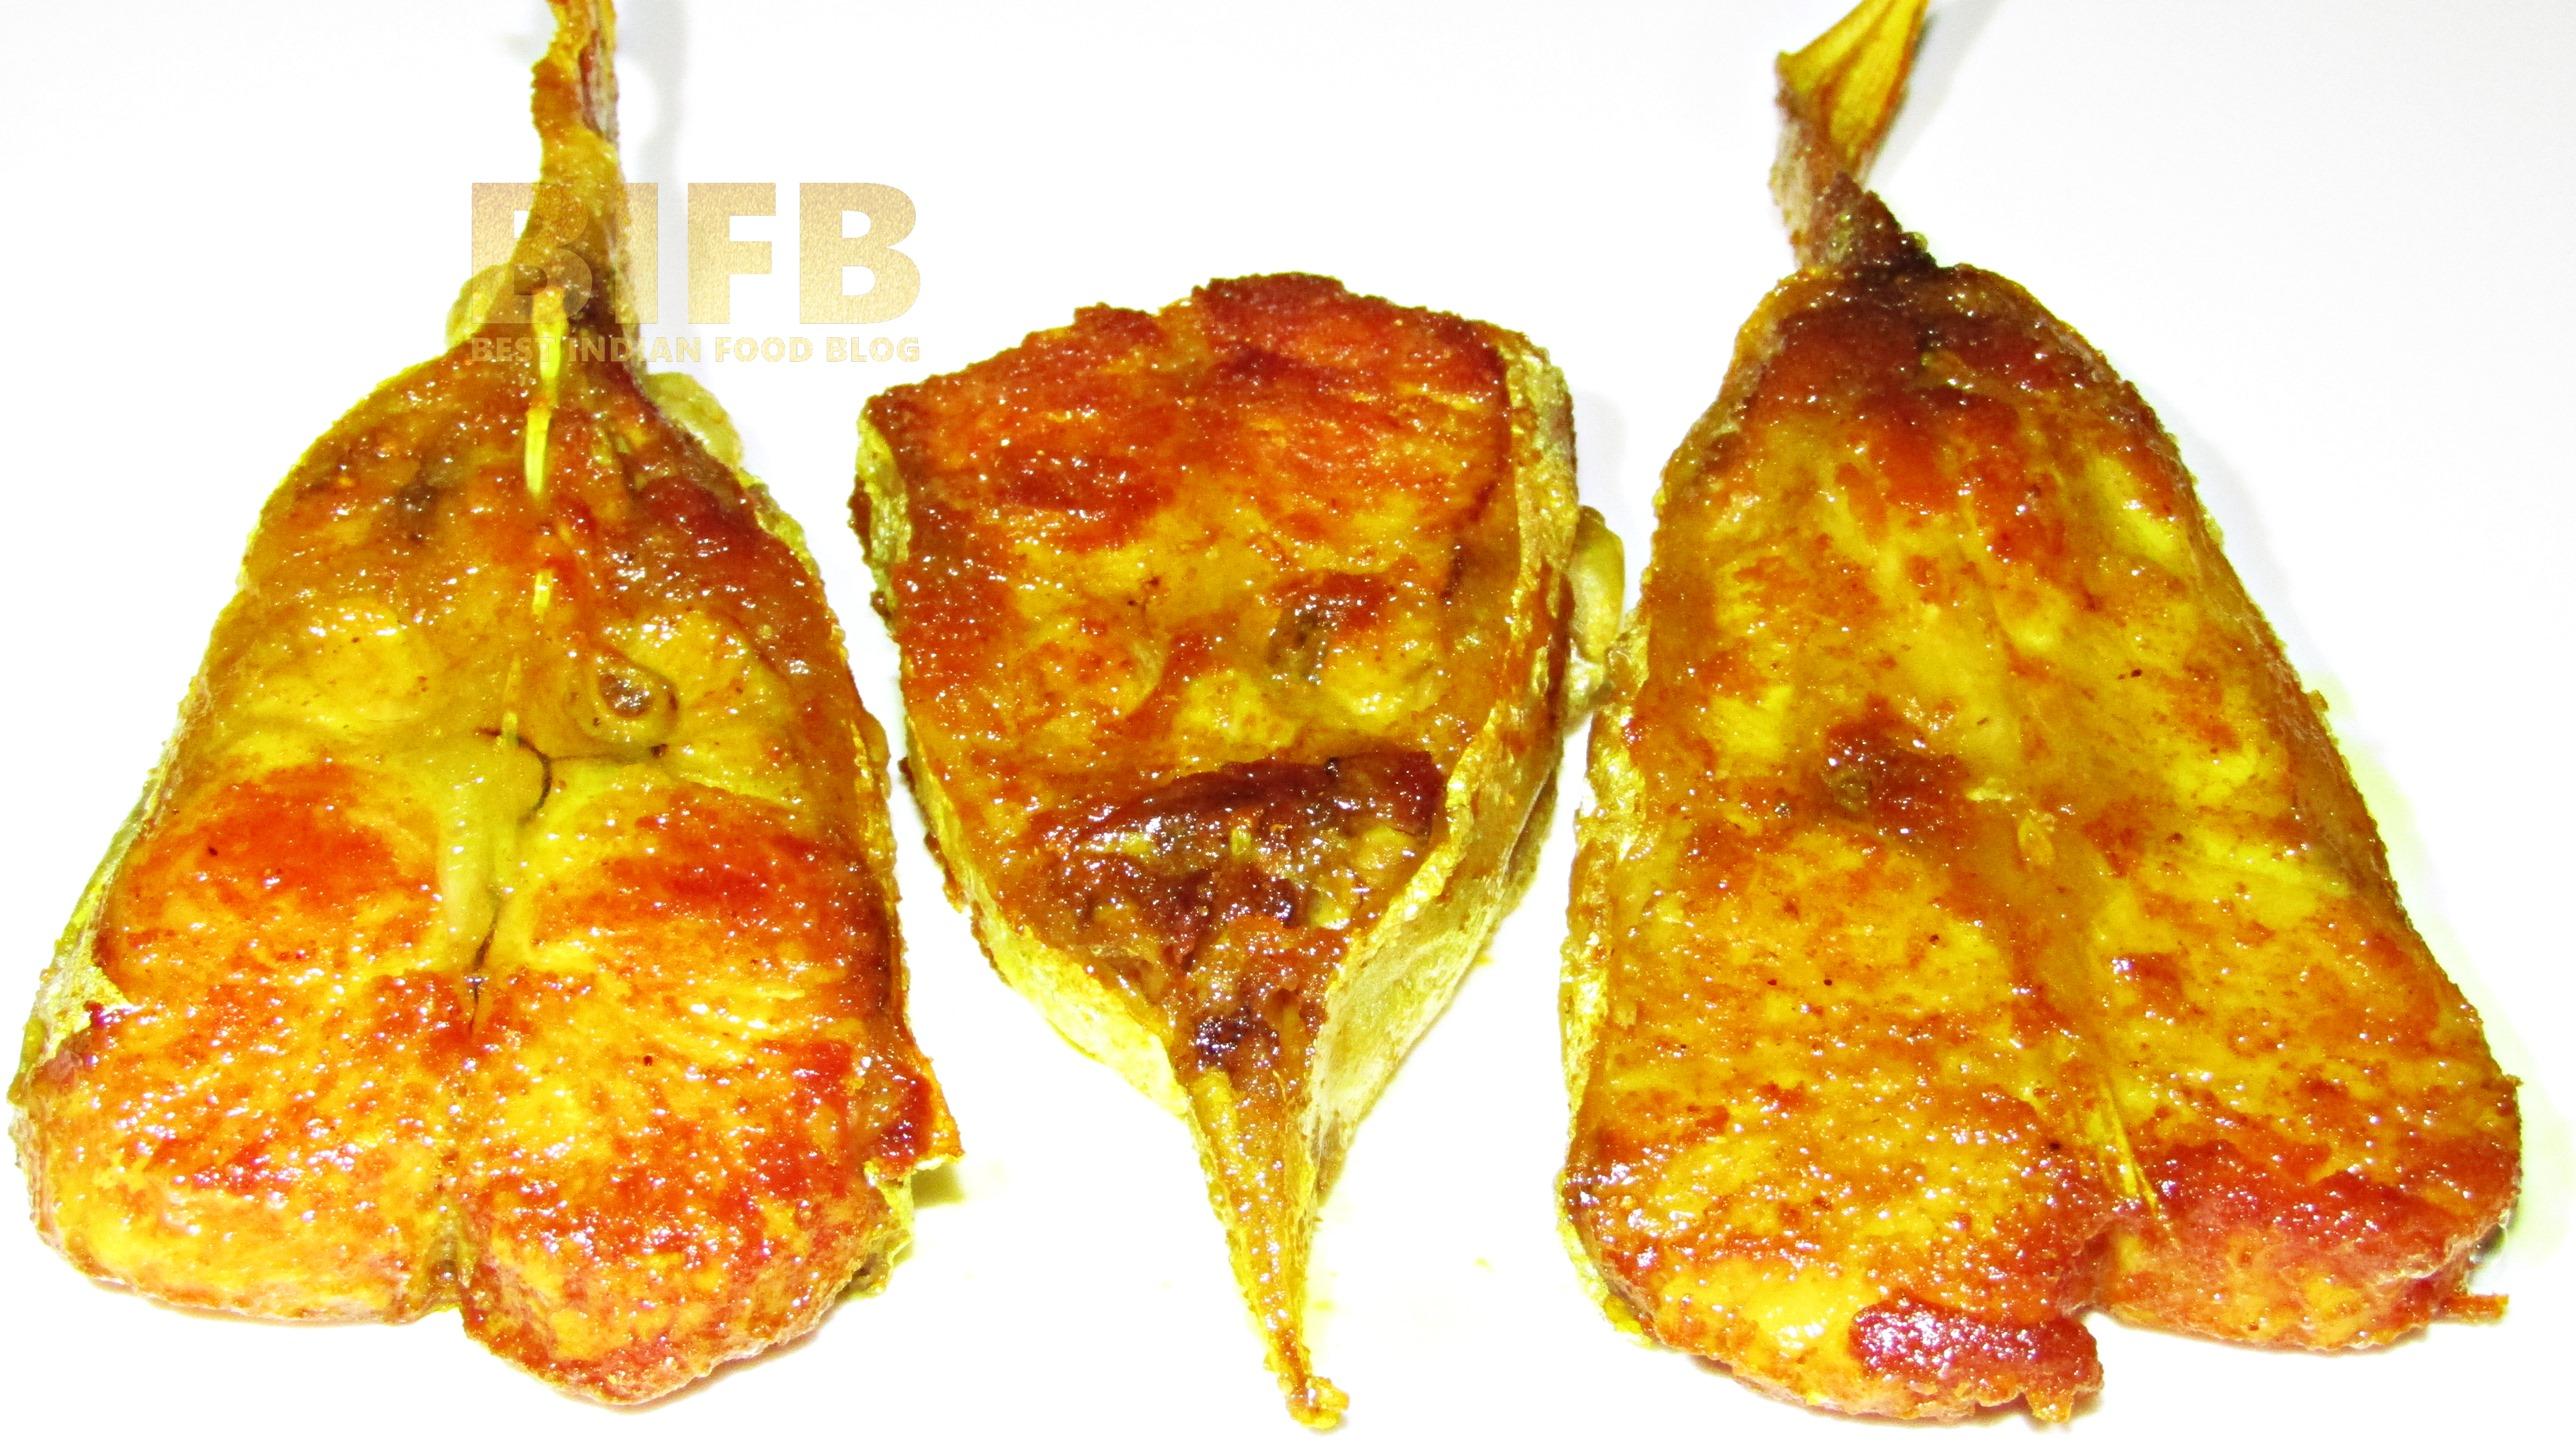 Pangas Mach Bhaja from West Bengal, India | Best Indian Food Blog | Pangasius Fish recipe